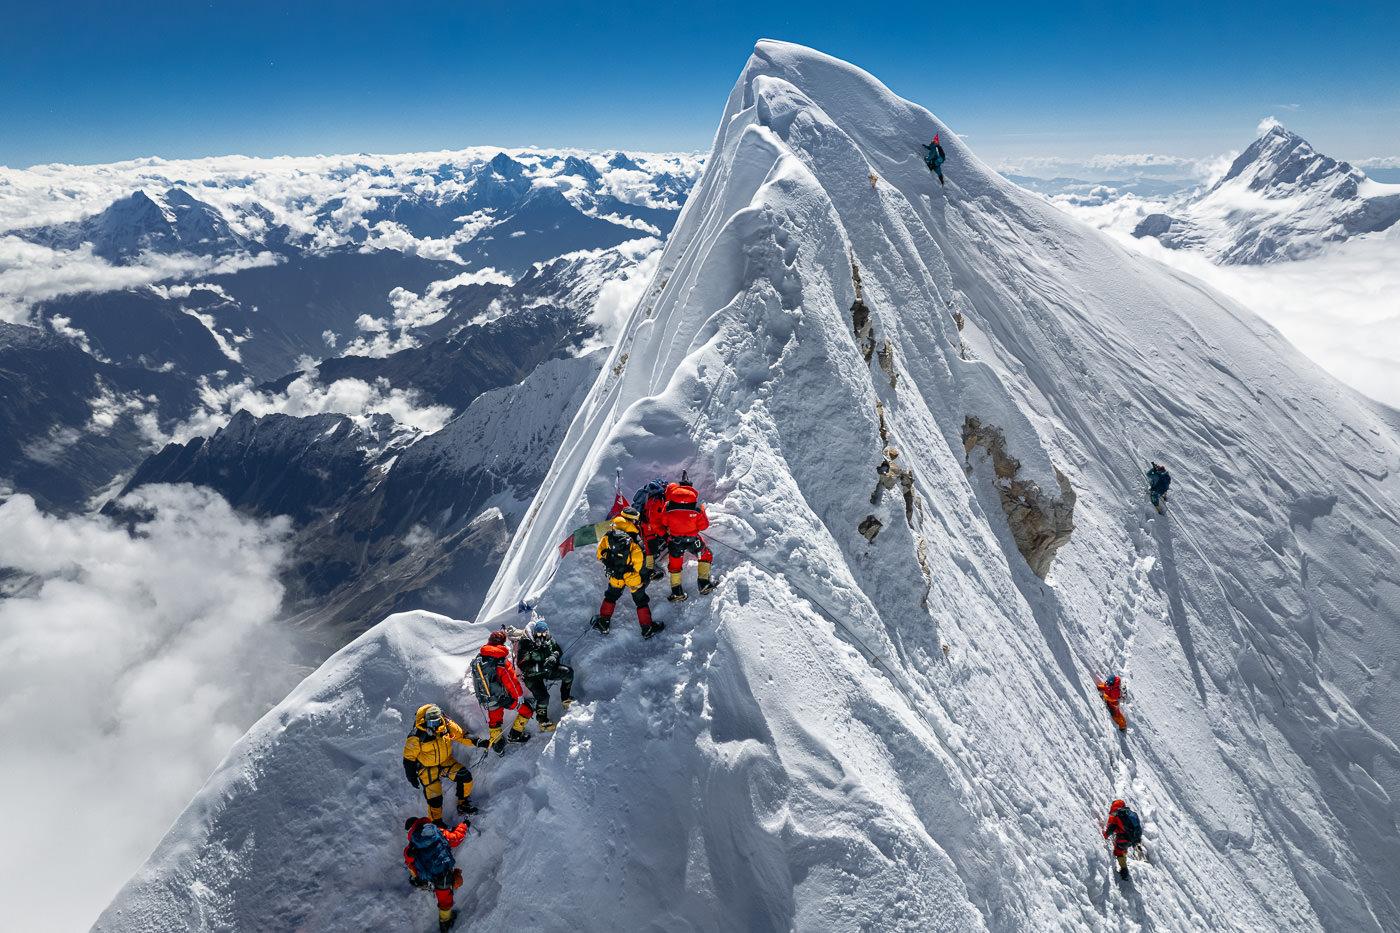 CLIMBING MANASLU MOUNTAIN (8163M) IN NEPAL